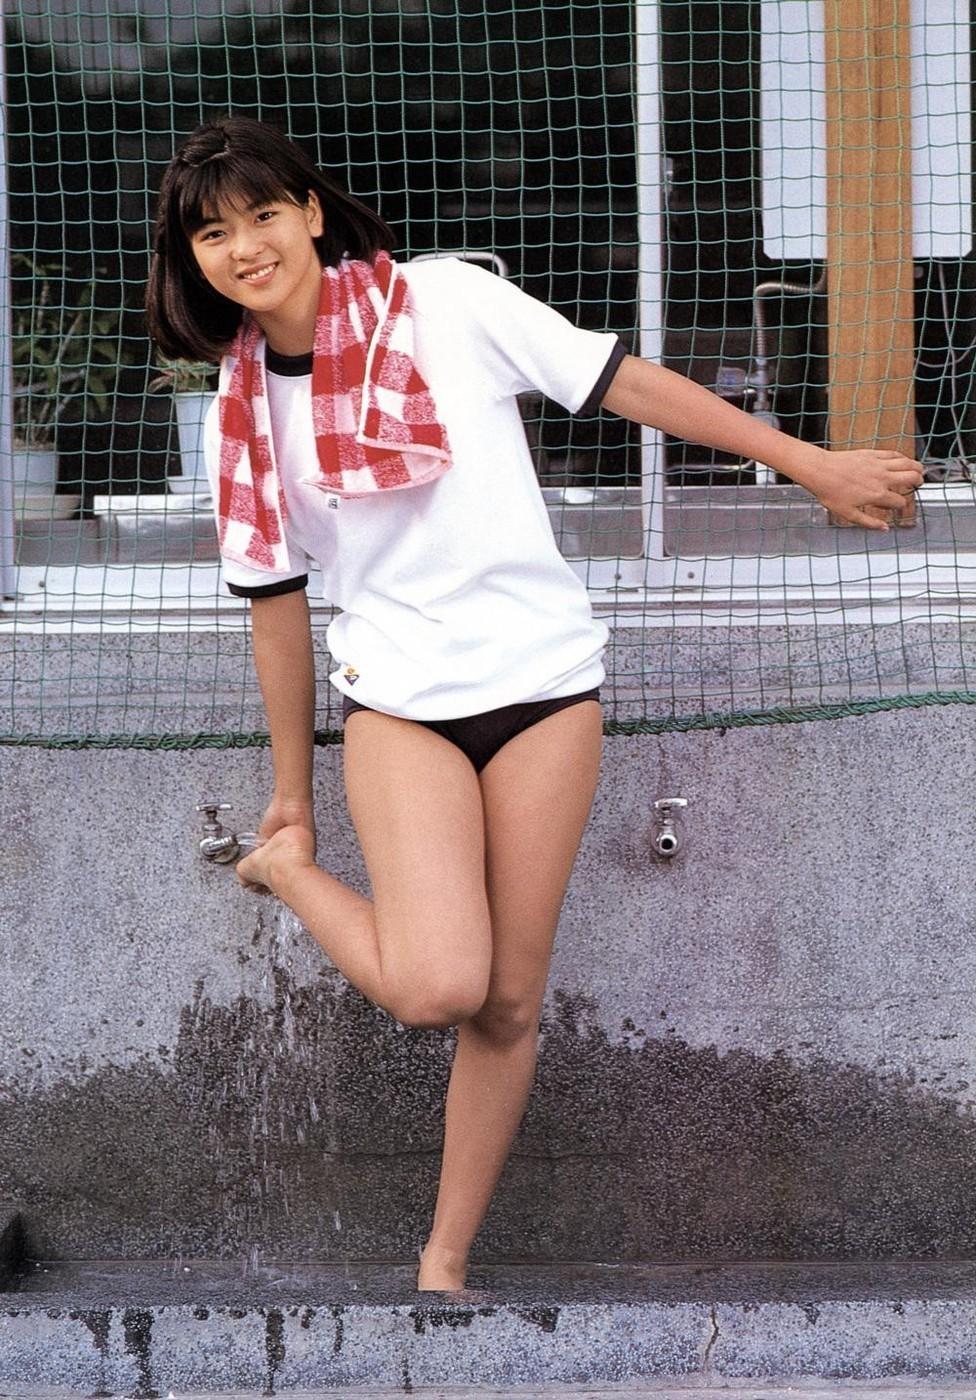 Shinobu Nakayama nudes (54 photos), Tits, Sideboobs, Feet, swimsuit 2017